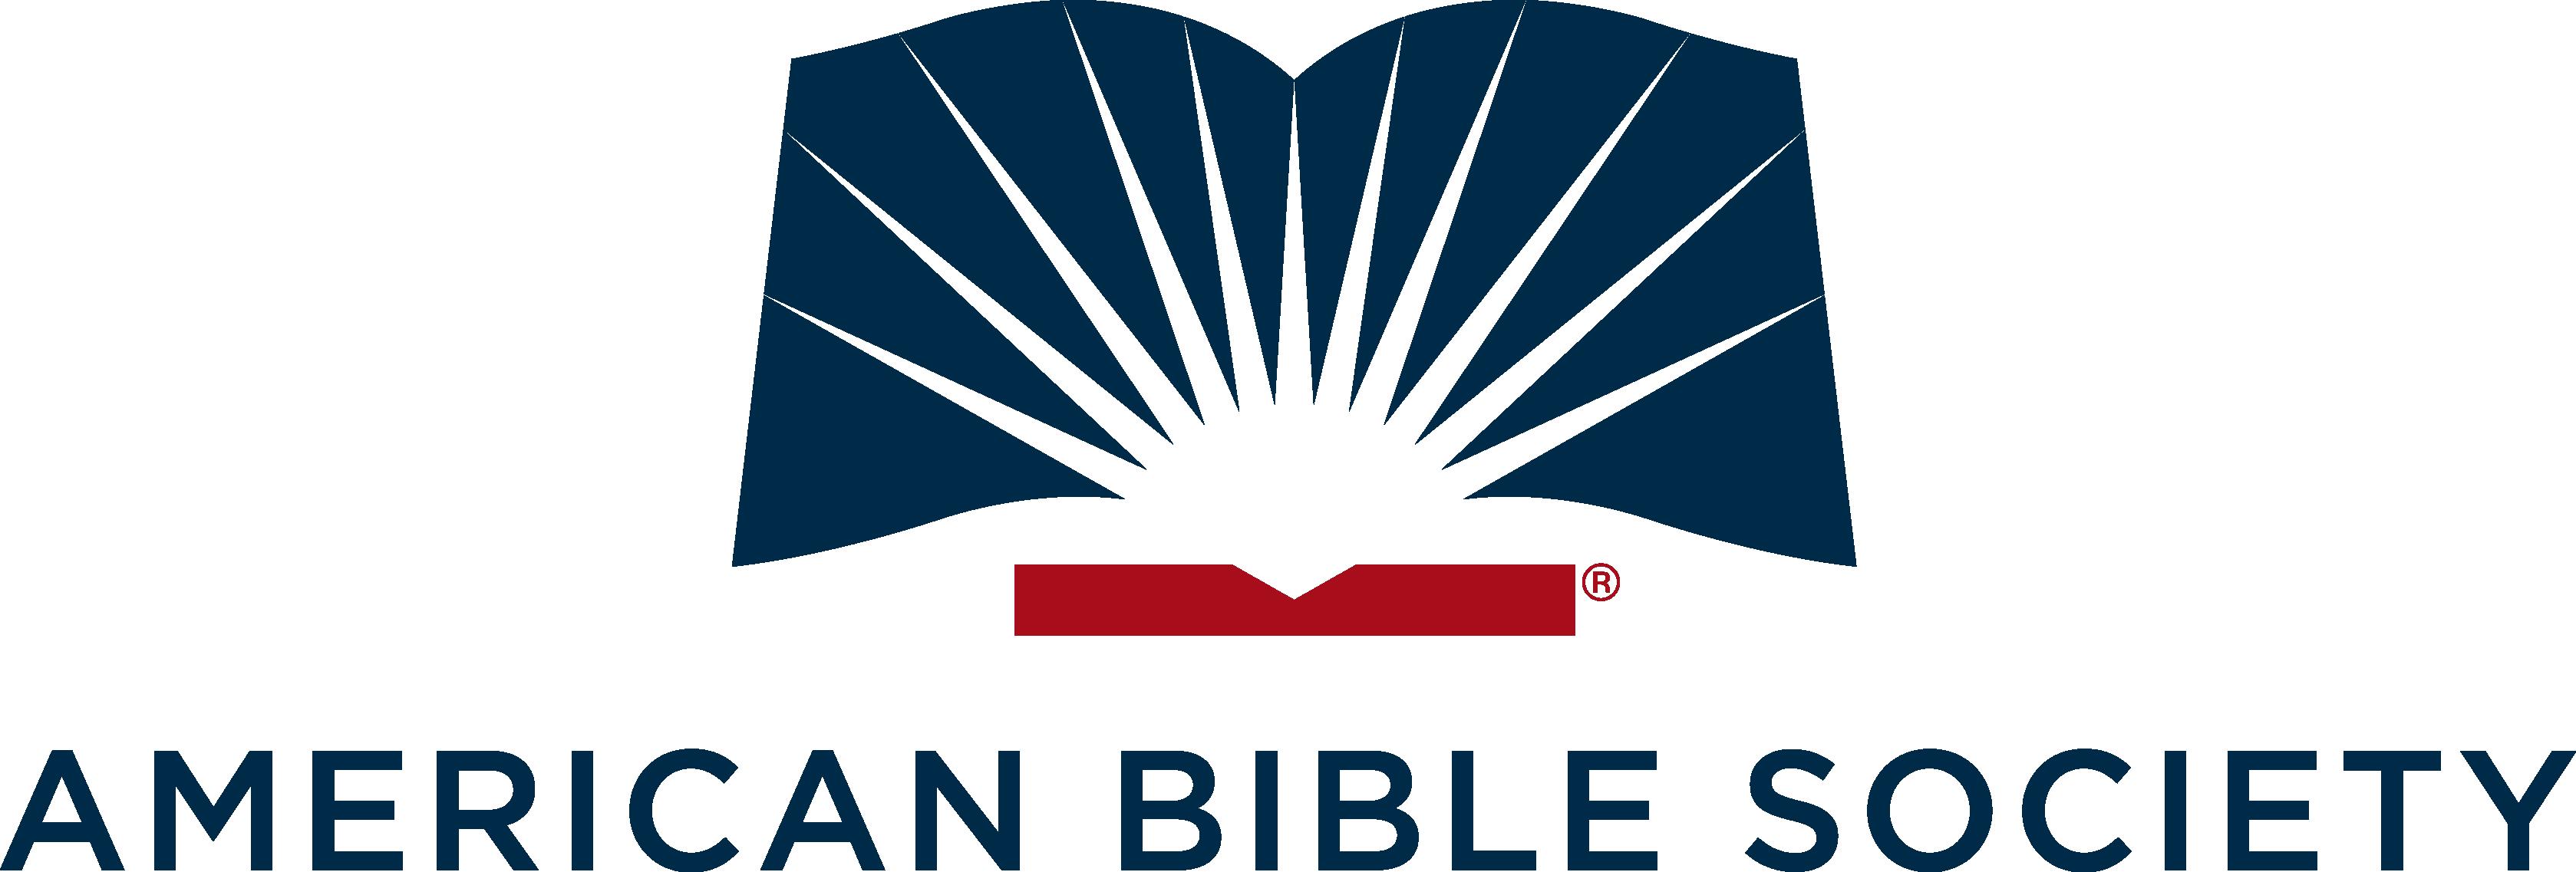 abs-logo-centered